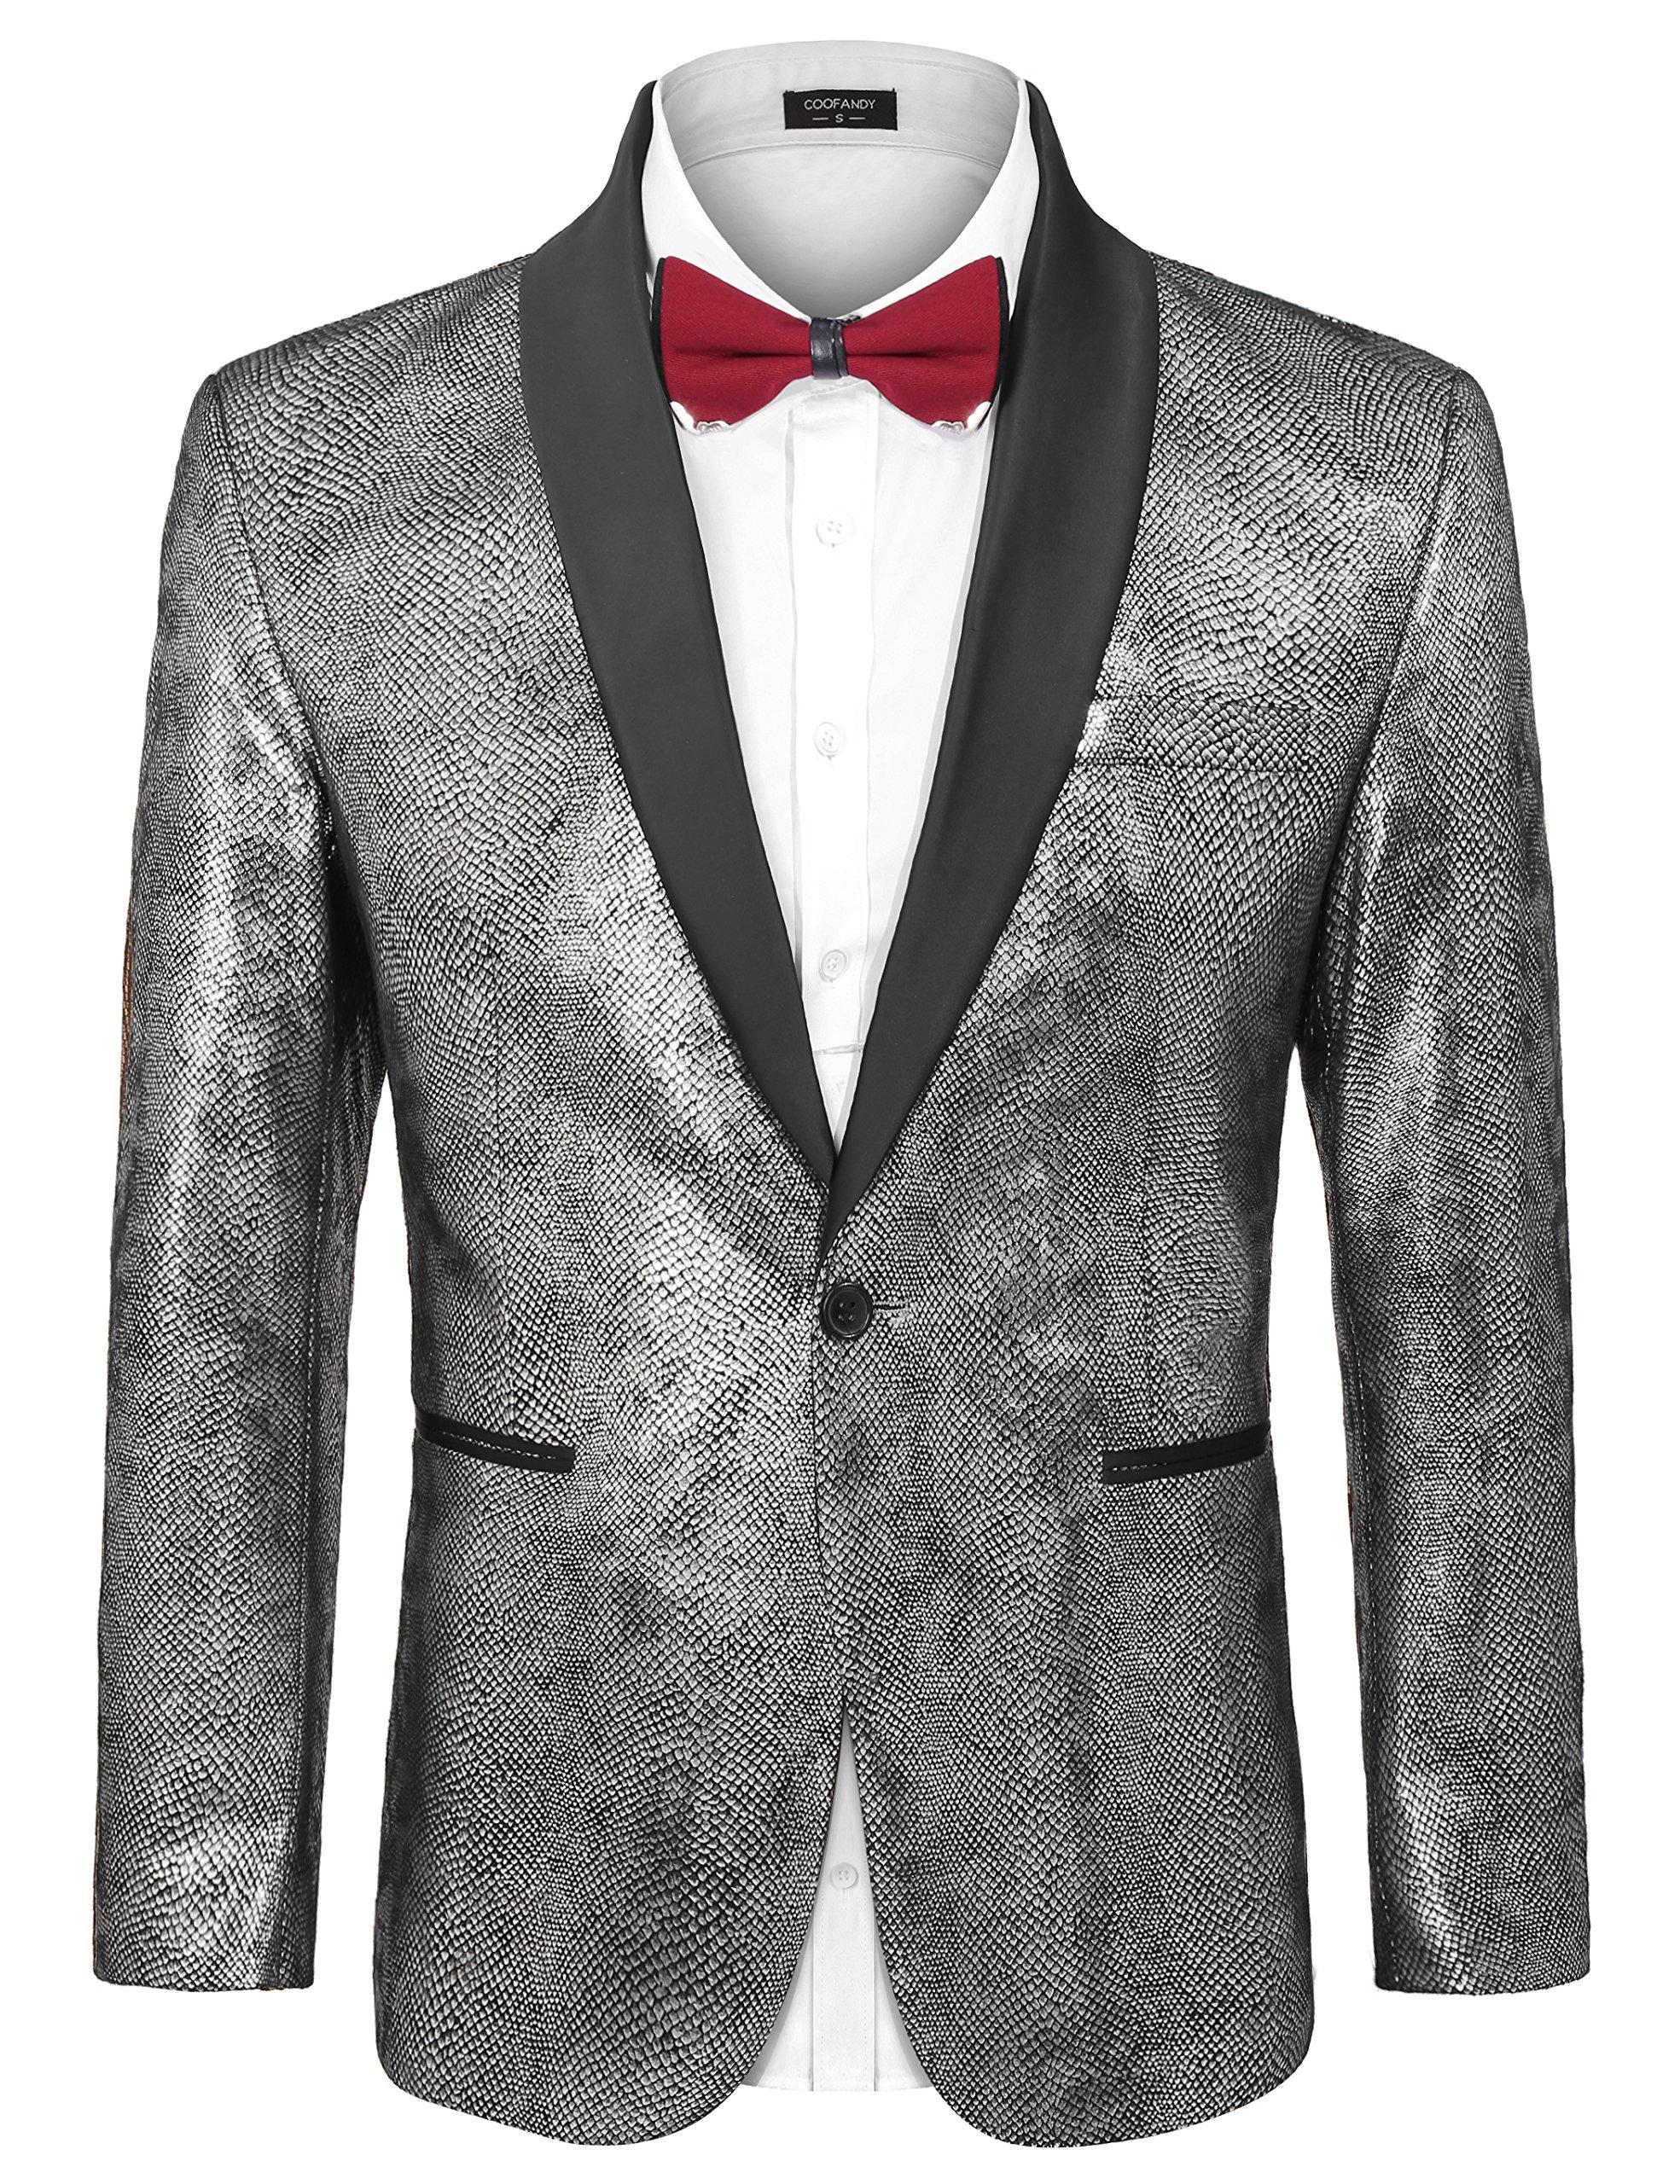 COOFANDY Men's Party Suit Jacket Slim Fit Luxury One Button Lapel Blazer Dress Wedding Dinner Prom Tuxedo Gold Silver